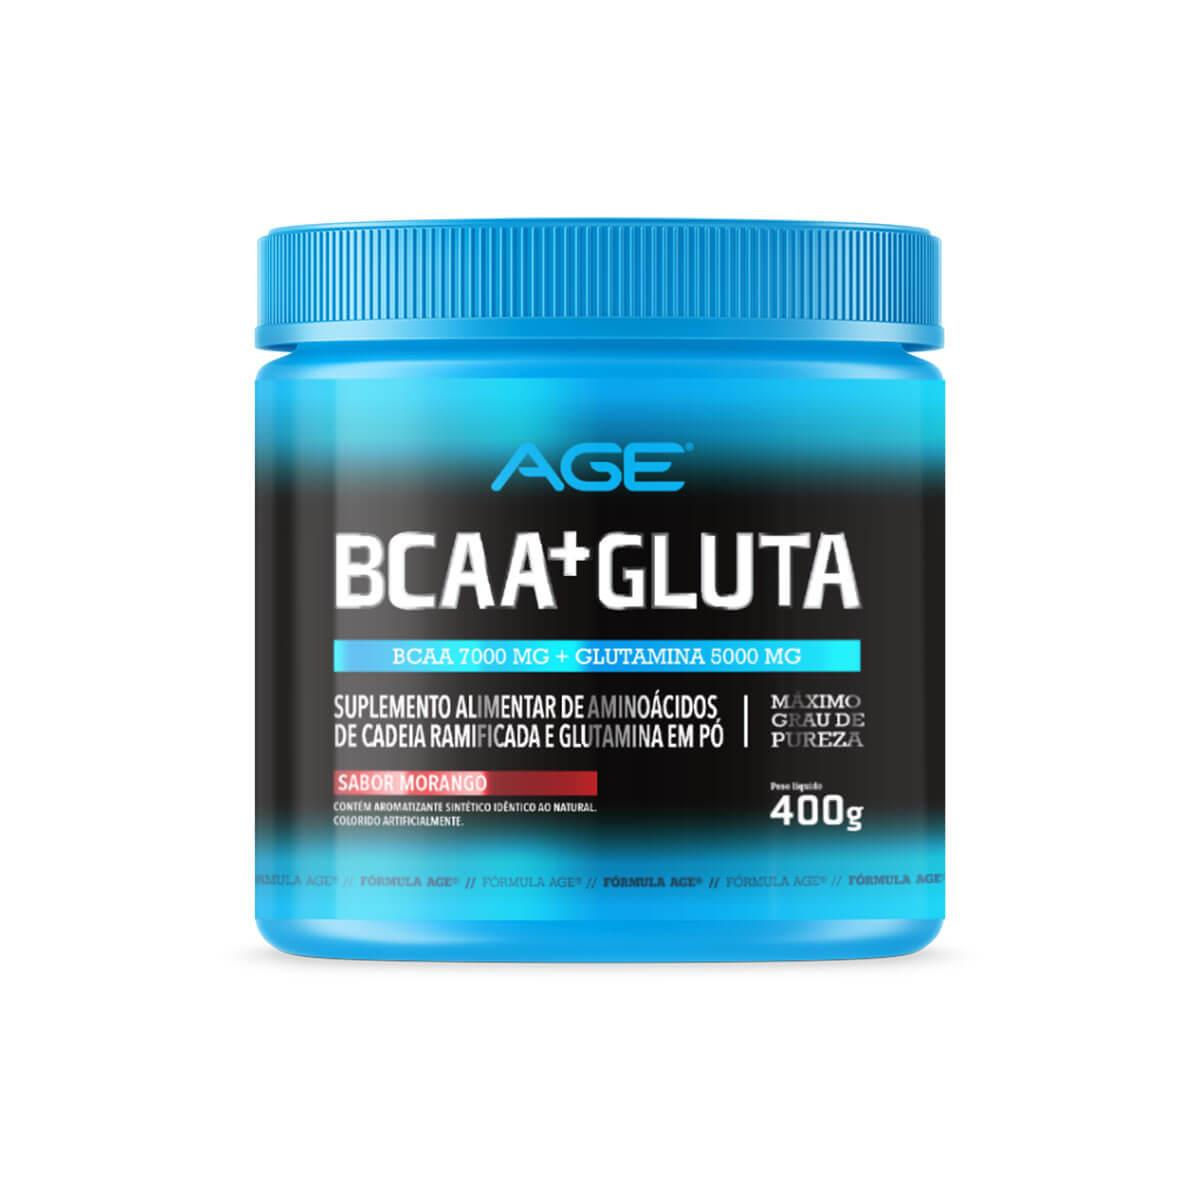 BCAA + GLUTAMINA (400g) - Morango - AGE